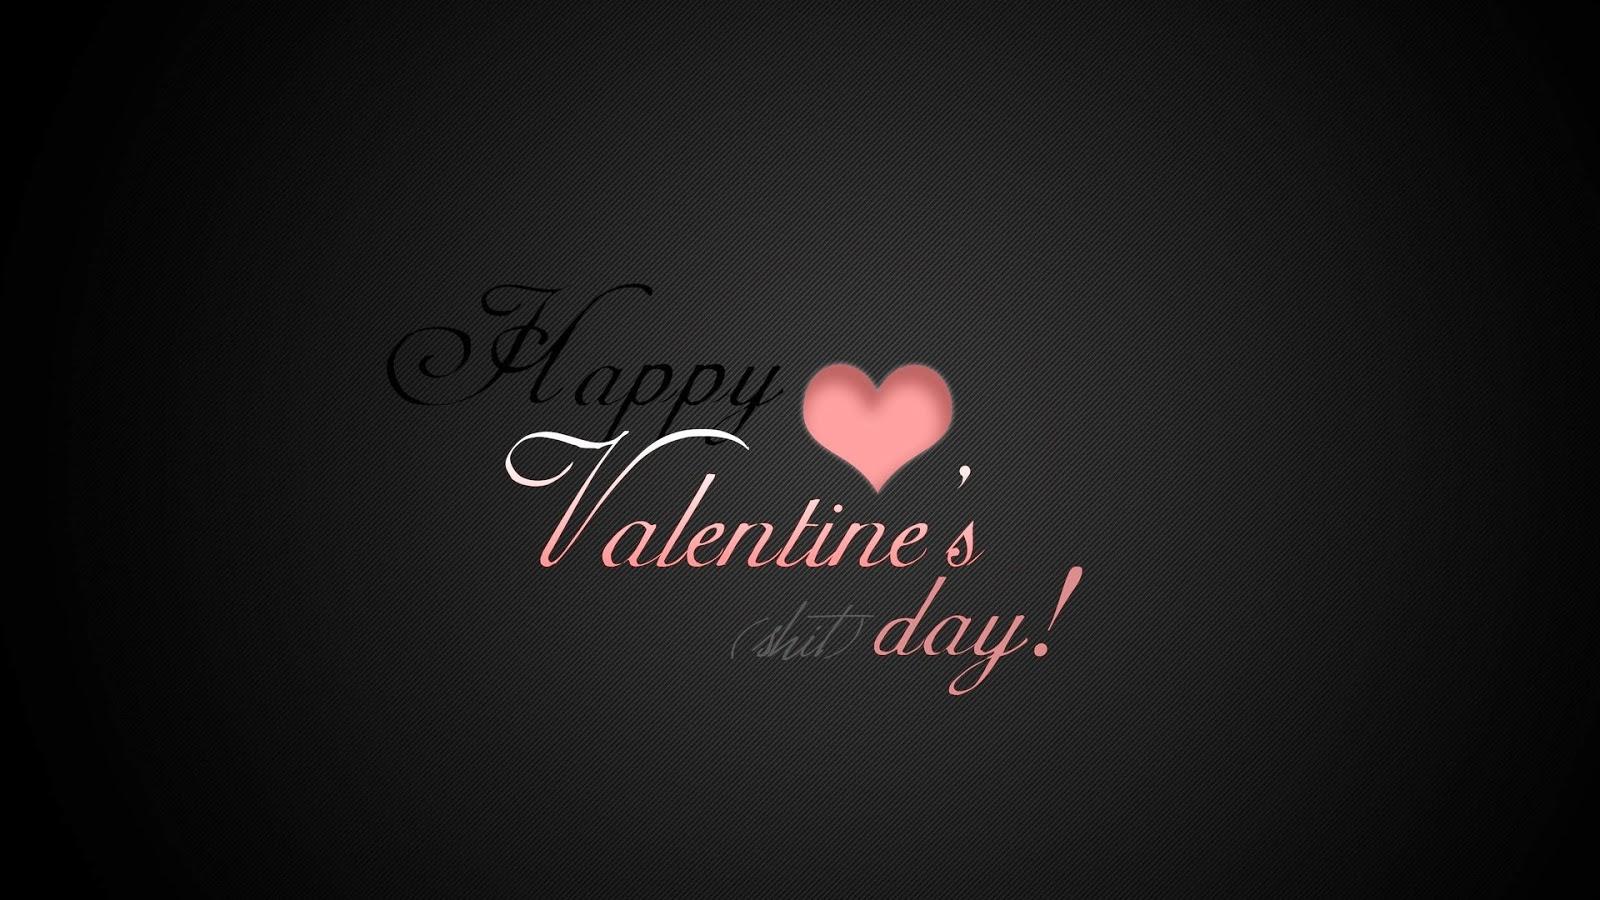 Happy-Valentine's-day-with-heart-Black-background-picture-desktop.jpg